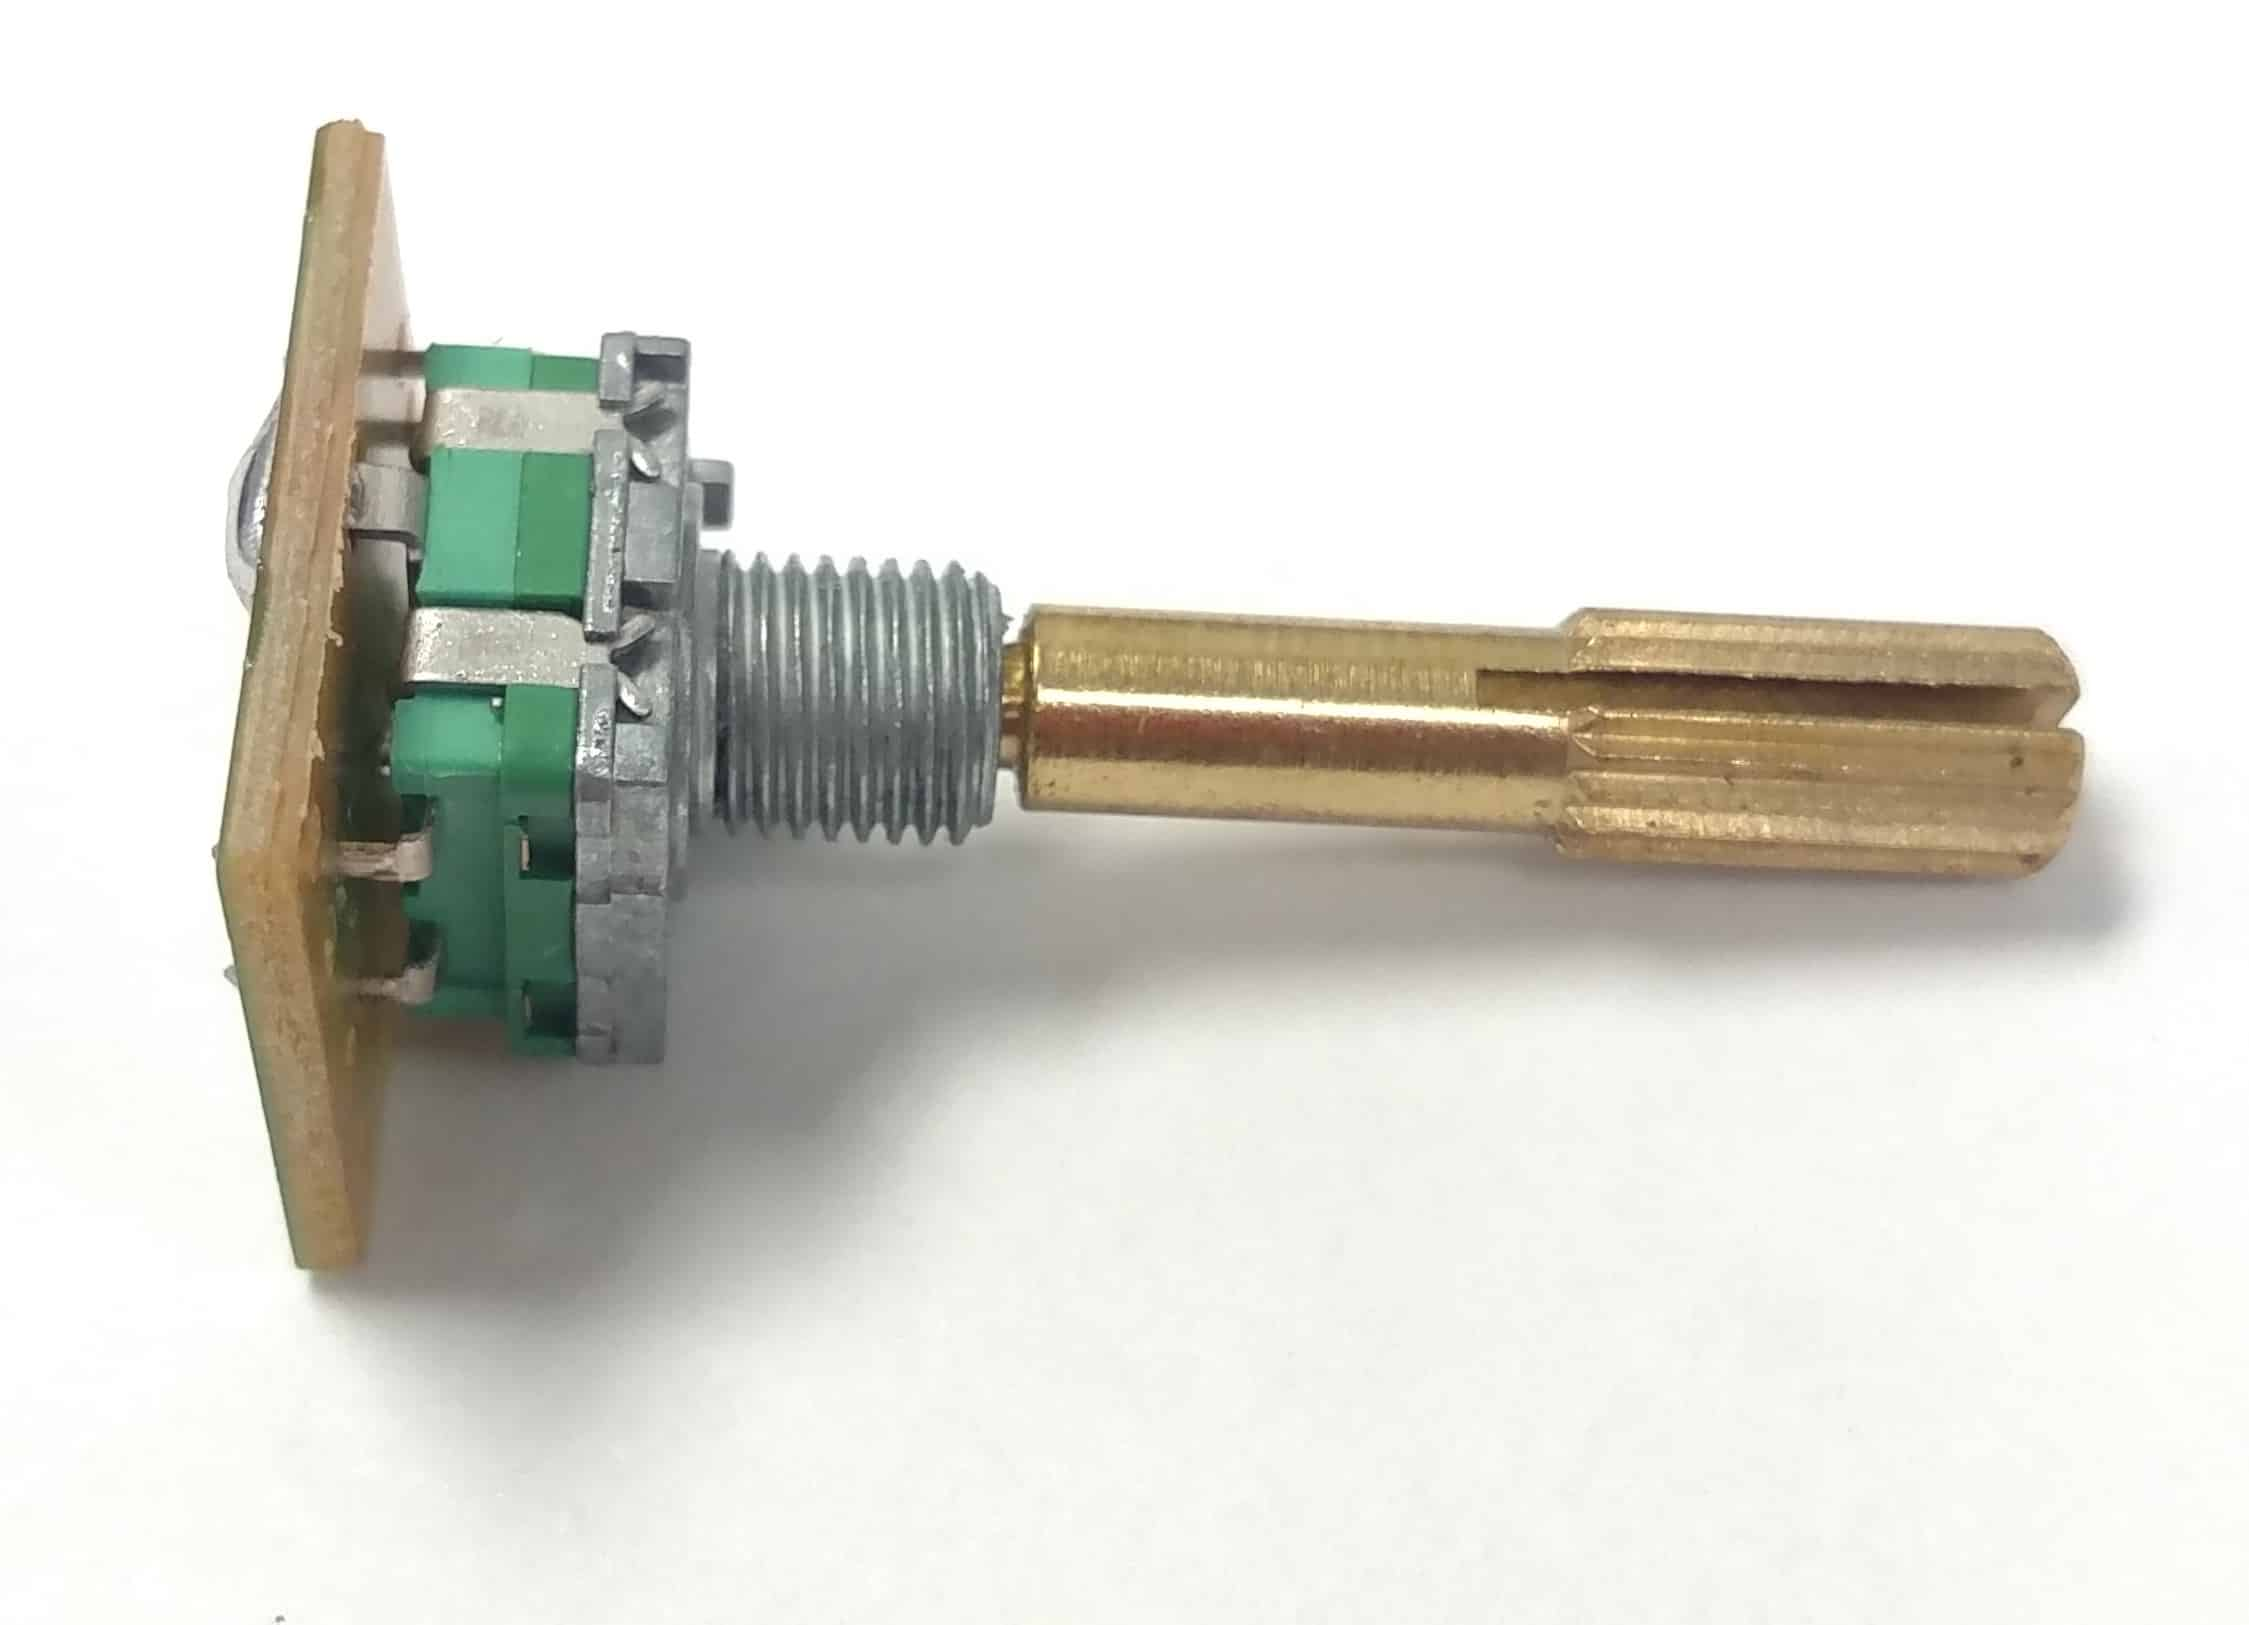 008047 - Cobra® Channel Selector for Cobra® 29LX Radio